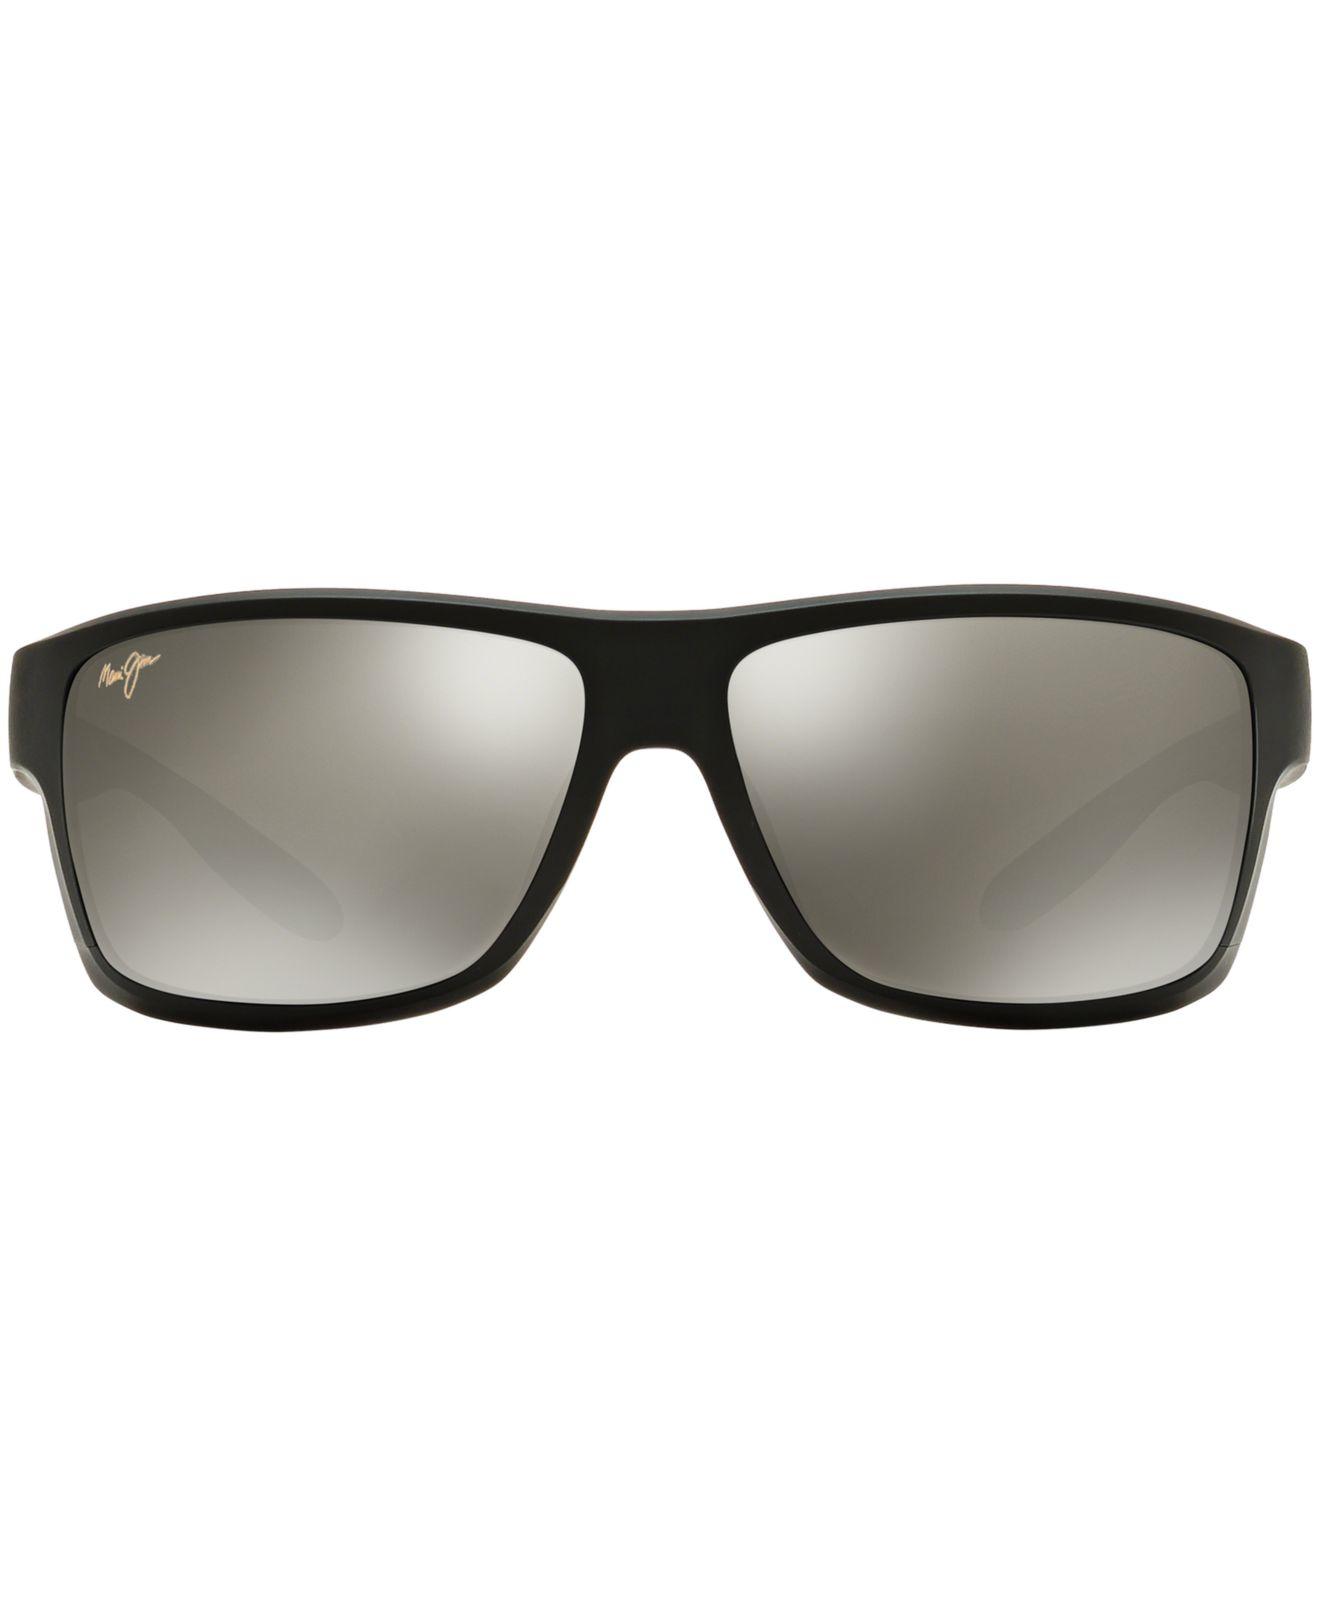 7eed4aff74e68 Lyst - Maui Jim 528 Pokahu in Black for Men